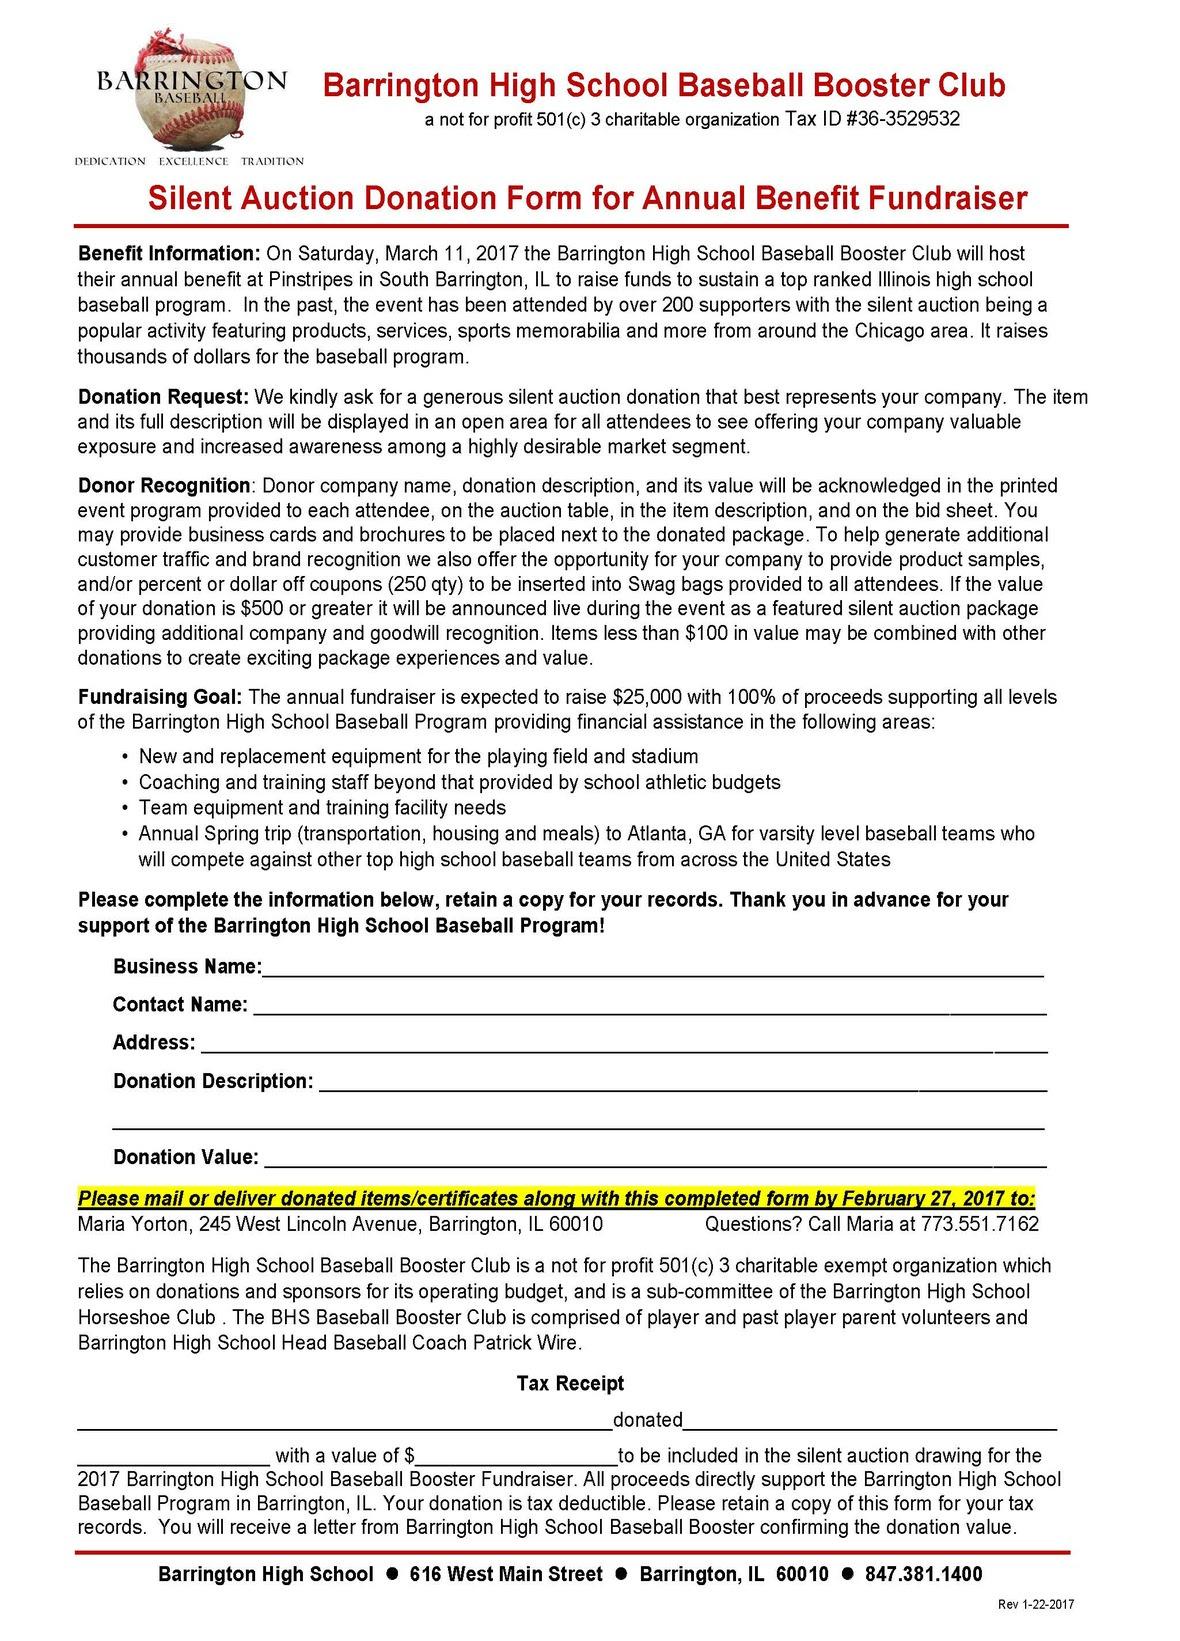 Silent Auction Donation Request Form - 2017BHSBaseballBoosterClub